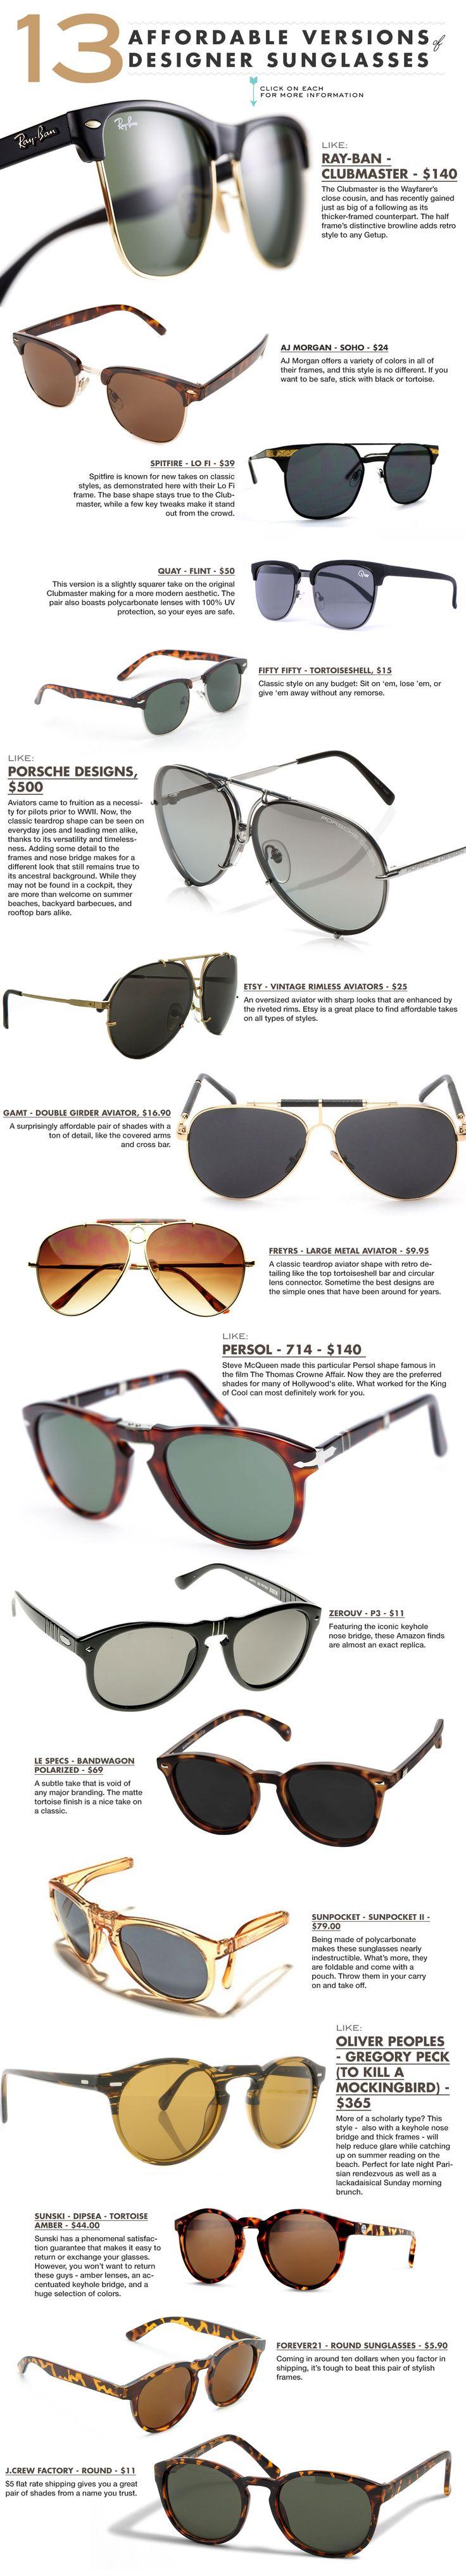 affordable versions of designer sunglasses